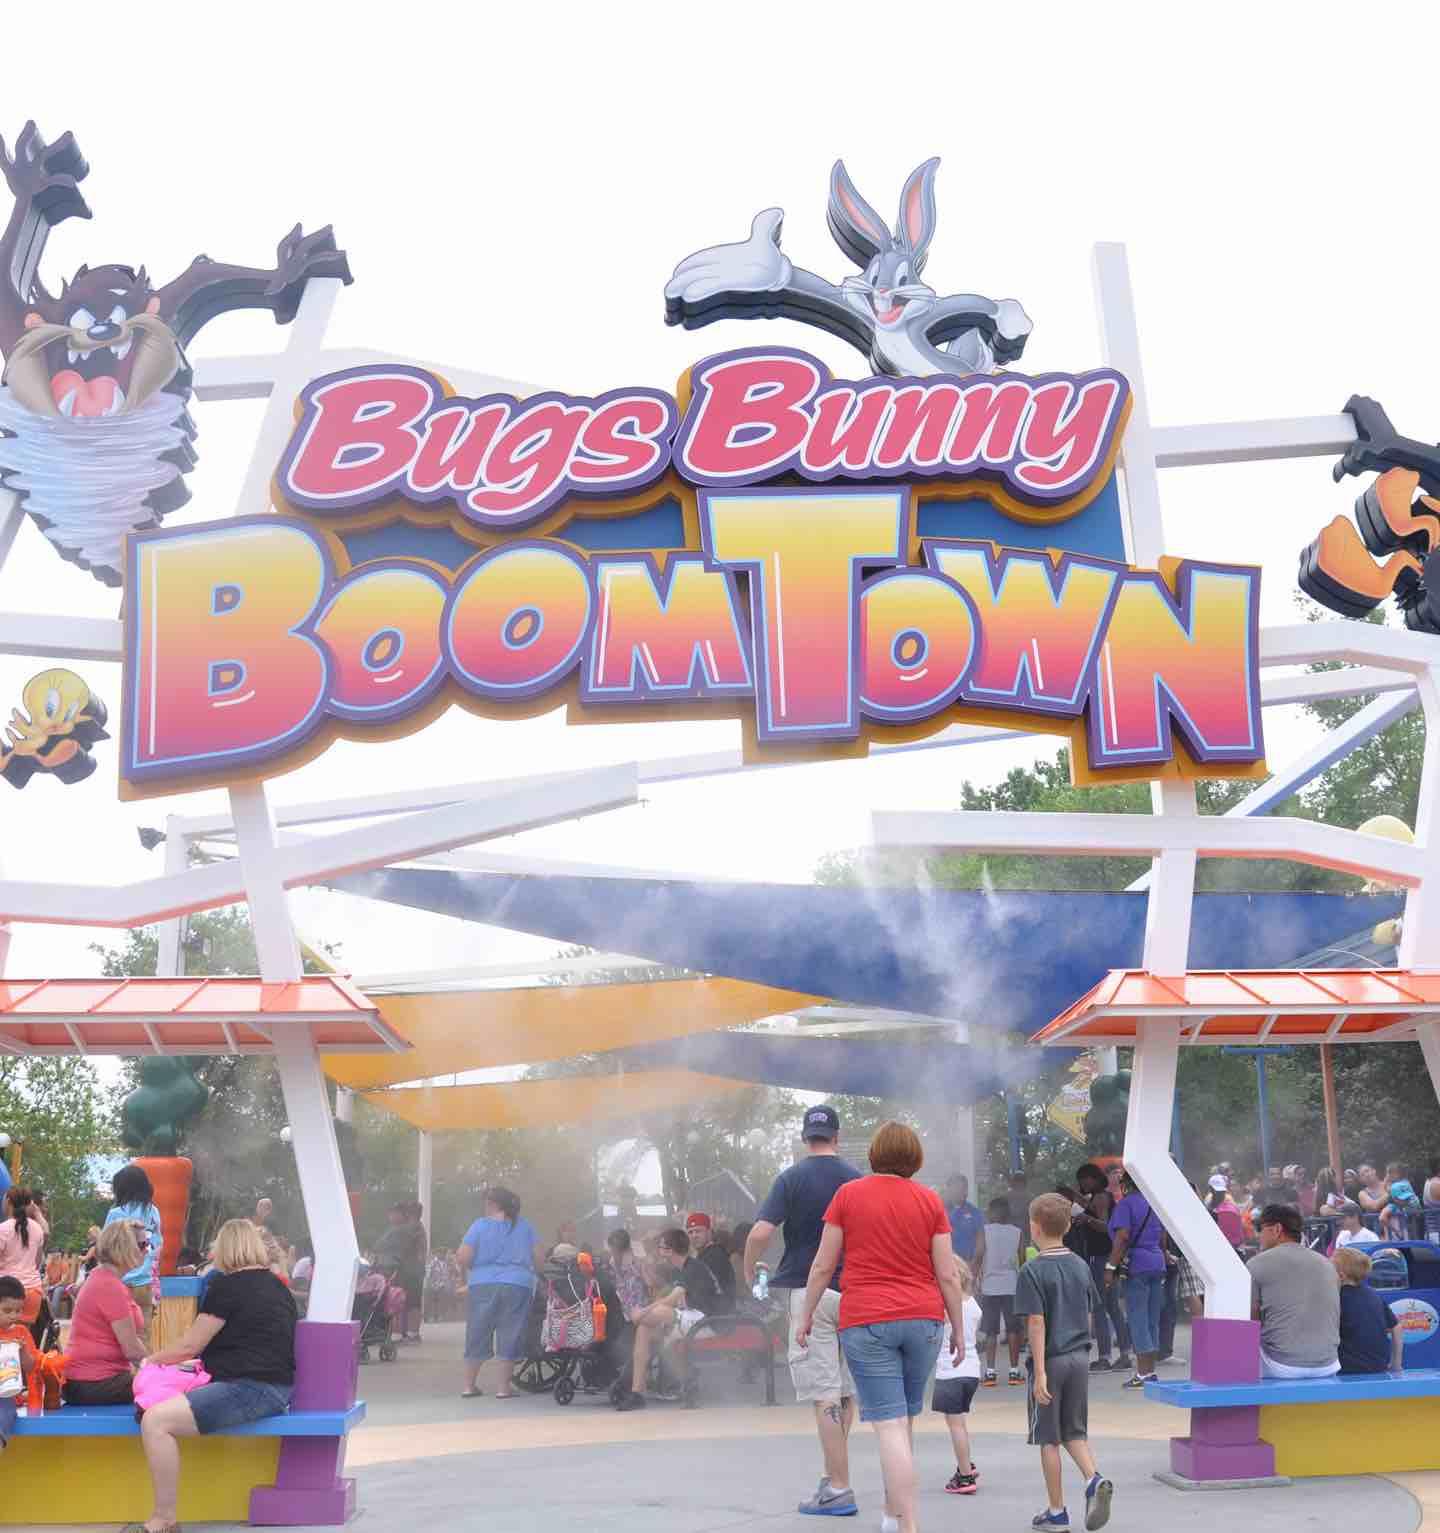 Sfot_bugs_bunny_boomtown_1440x1533_0